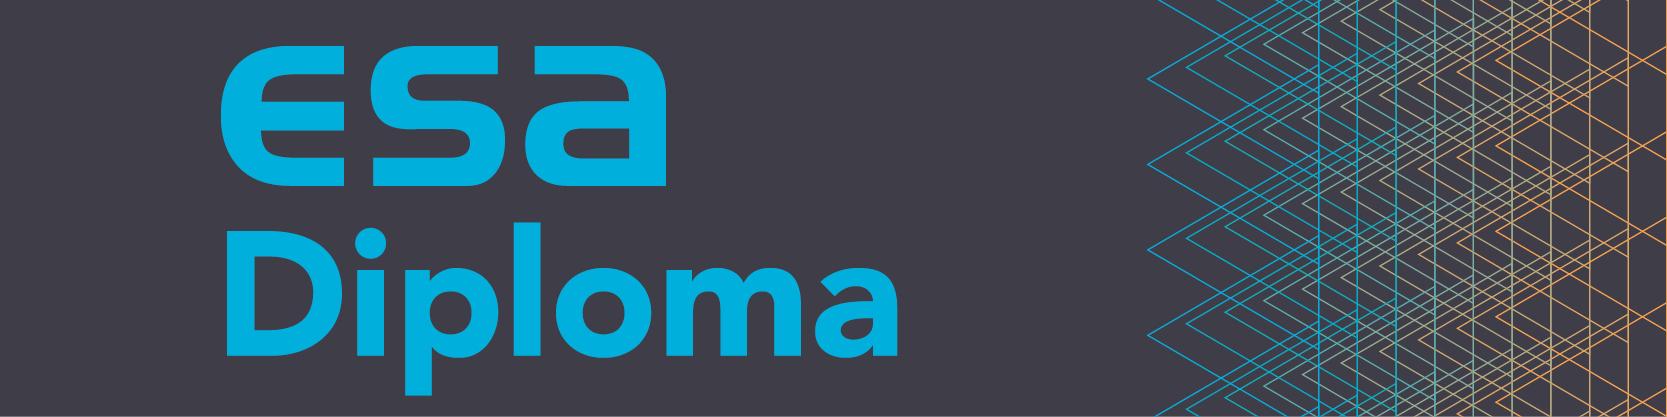 ESA Diploma-Header.jpg